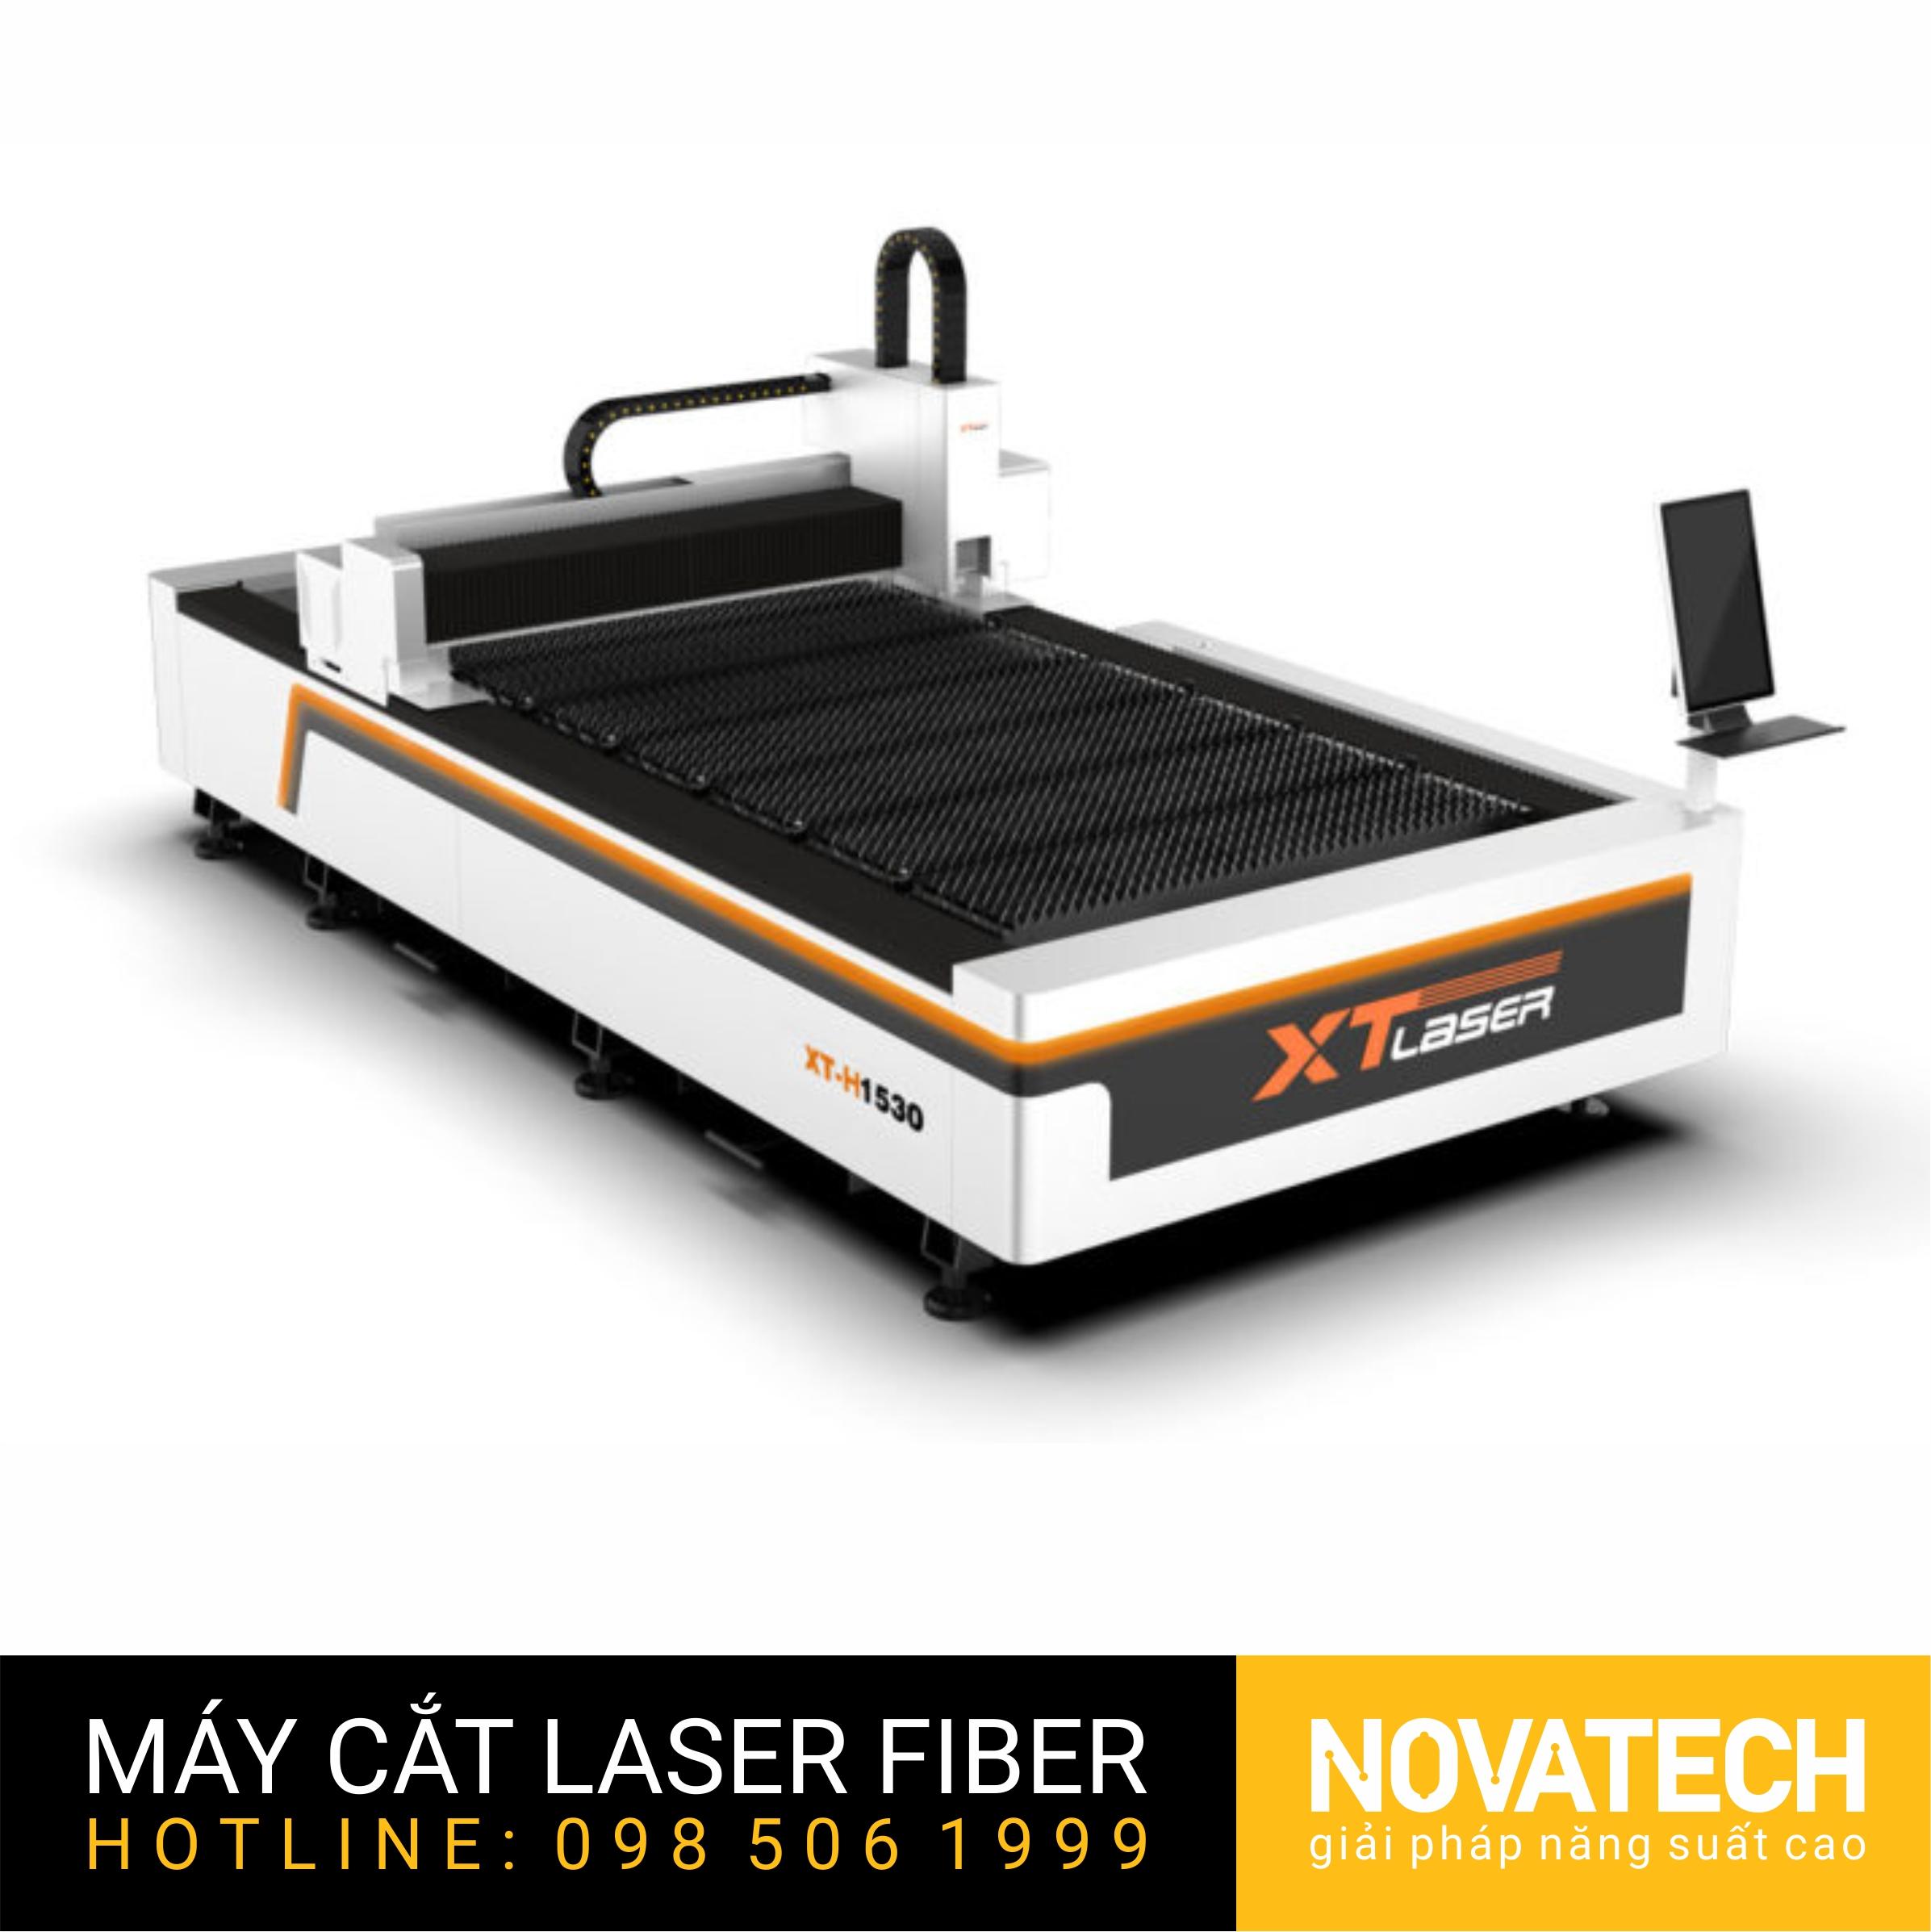 Máy cắt laser fiber bàn đơn XT-Laser H Series